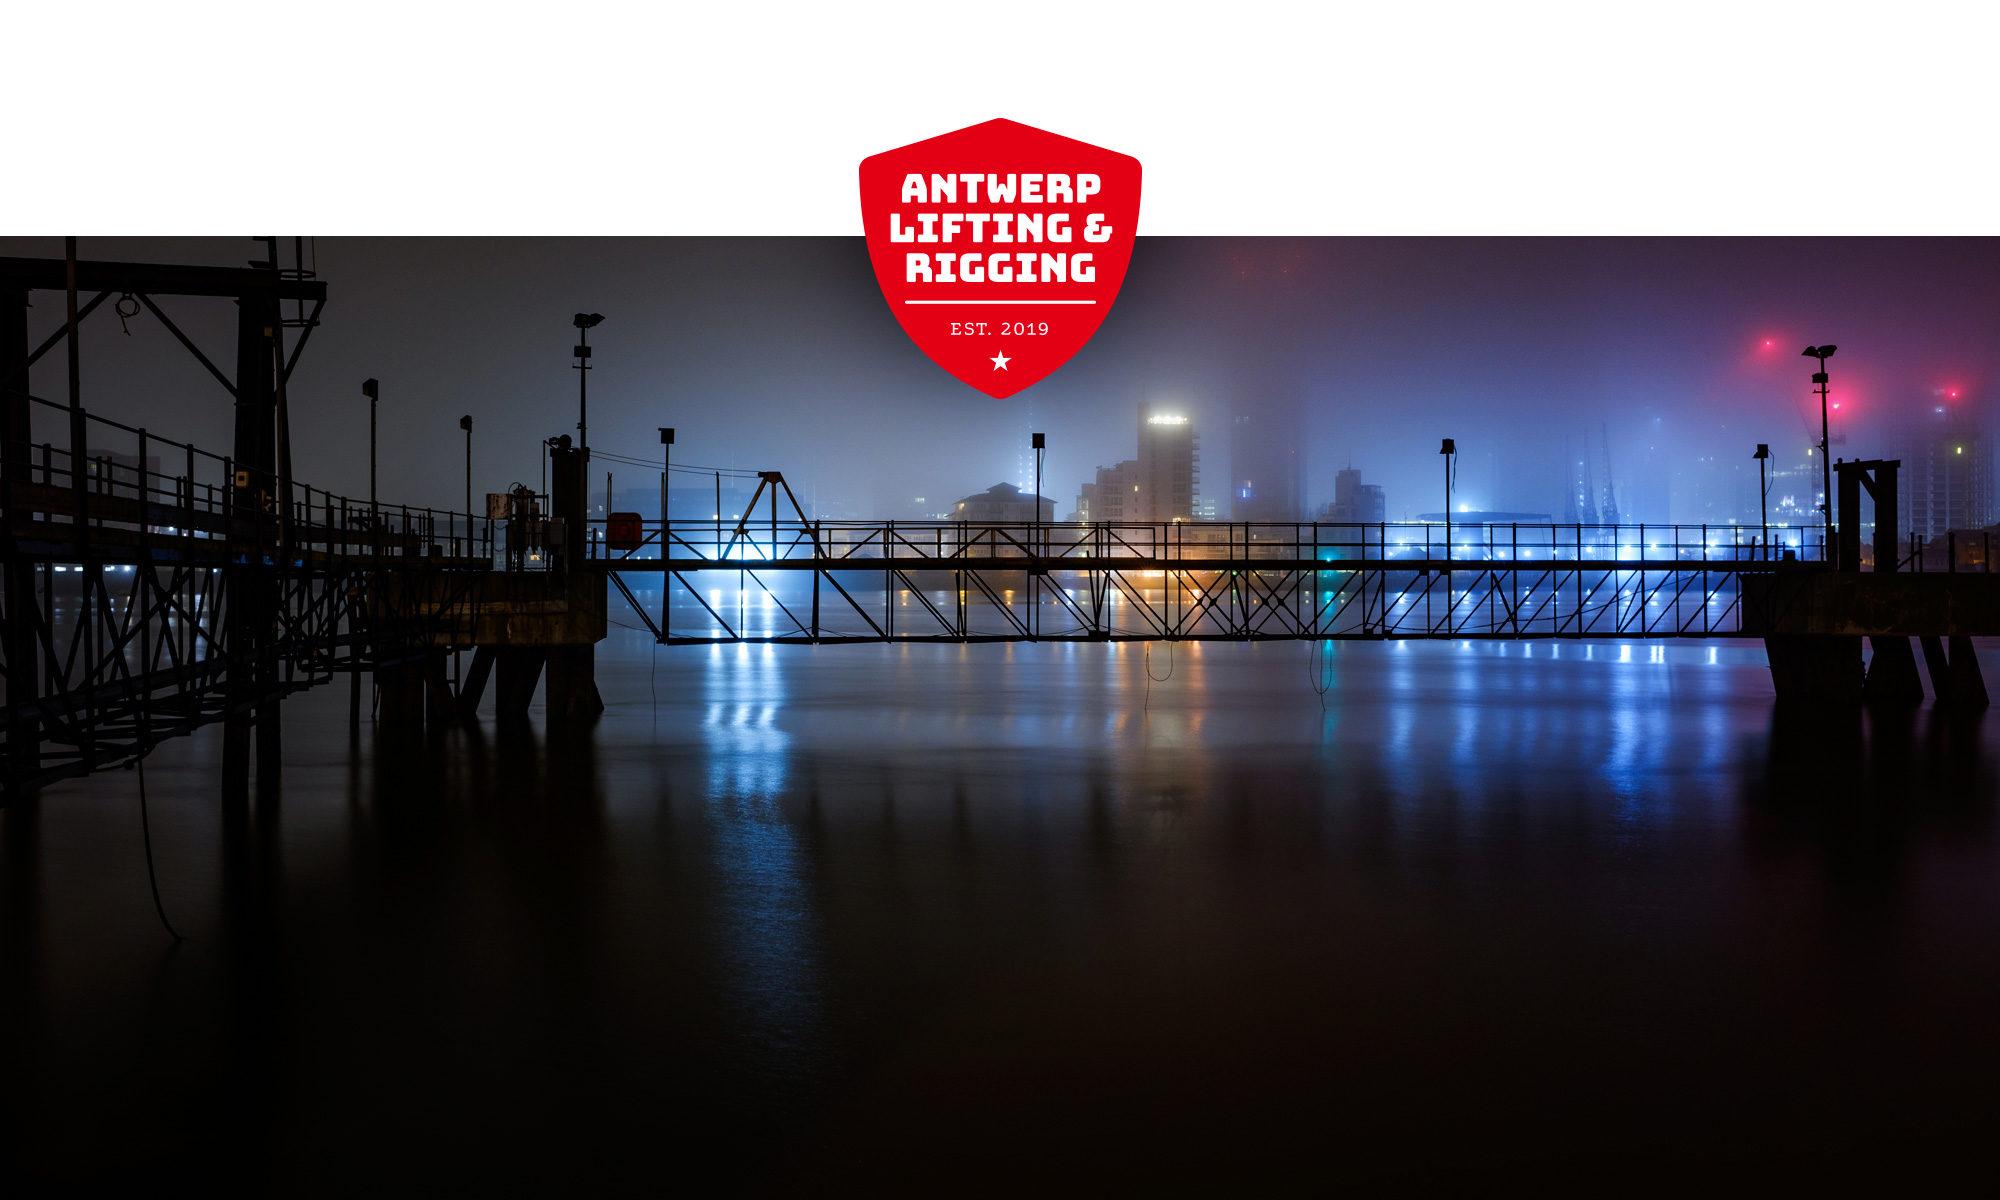 Antwerp Lifting & Rigging